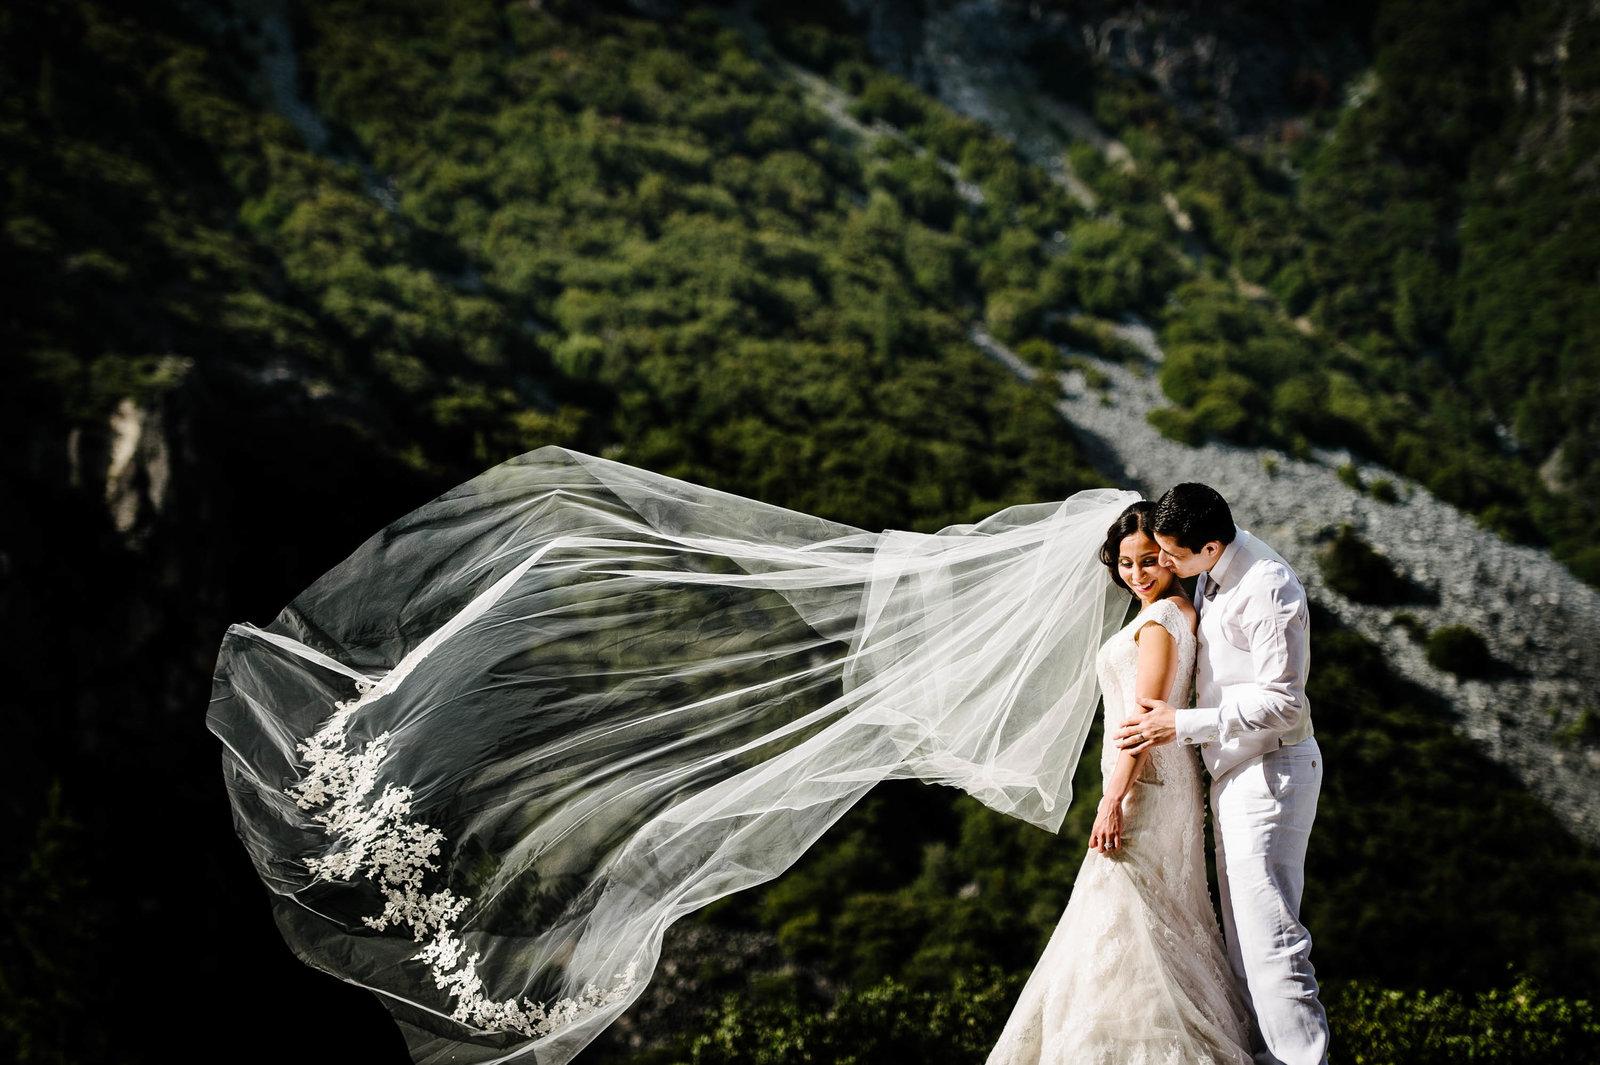 232-El-paso-wedding-photographer-MaJe_0453